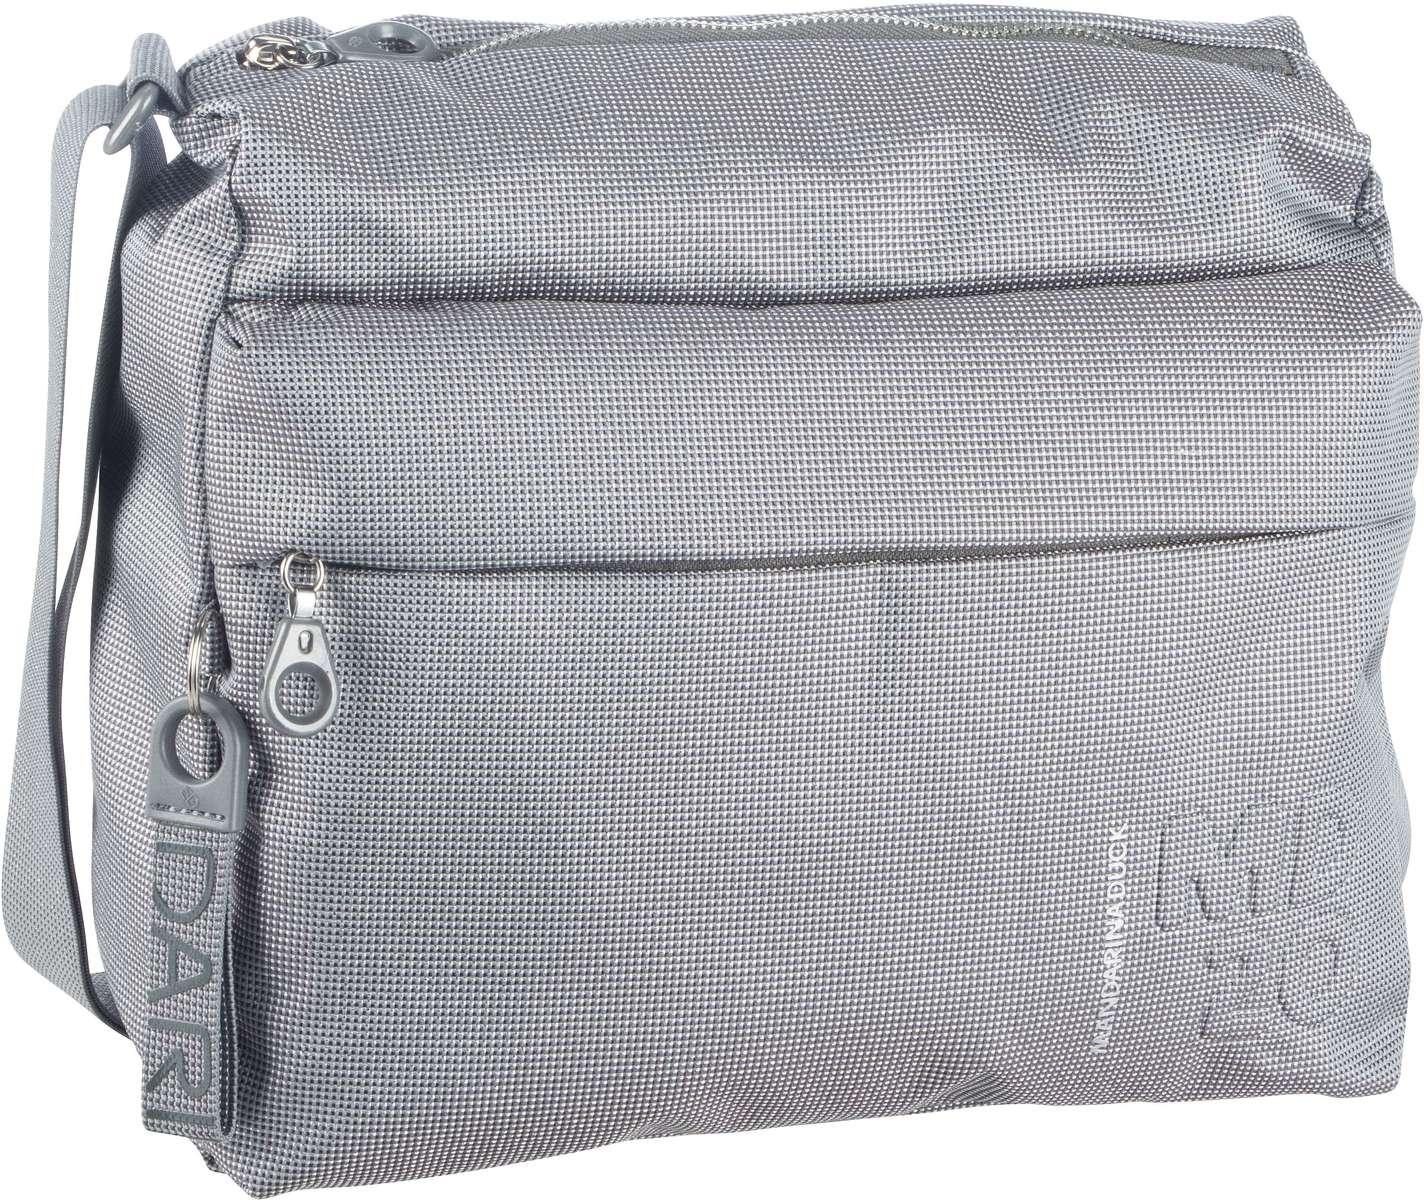 Umhängetasche MD20 Lux Crossover Bag QNTT4 Gun Metal